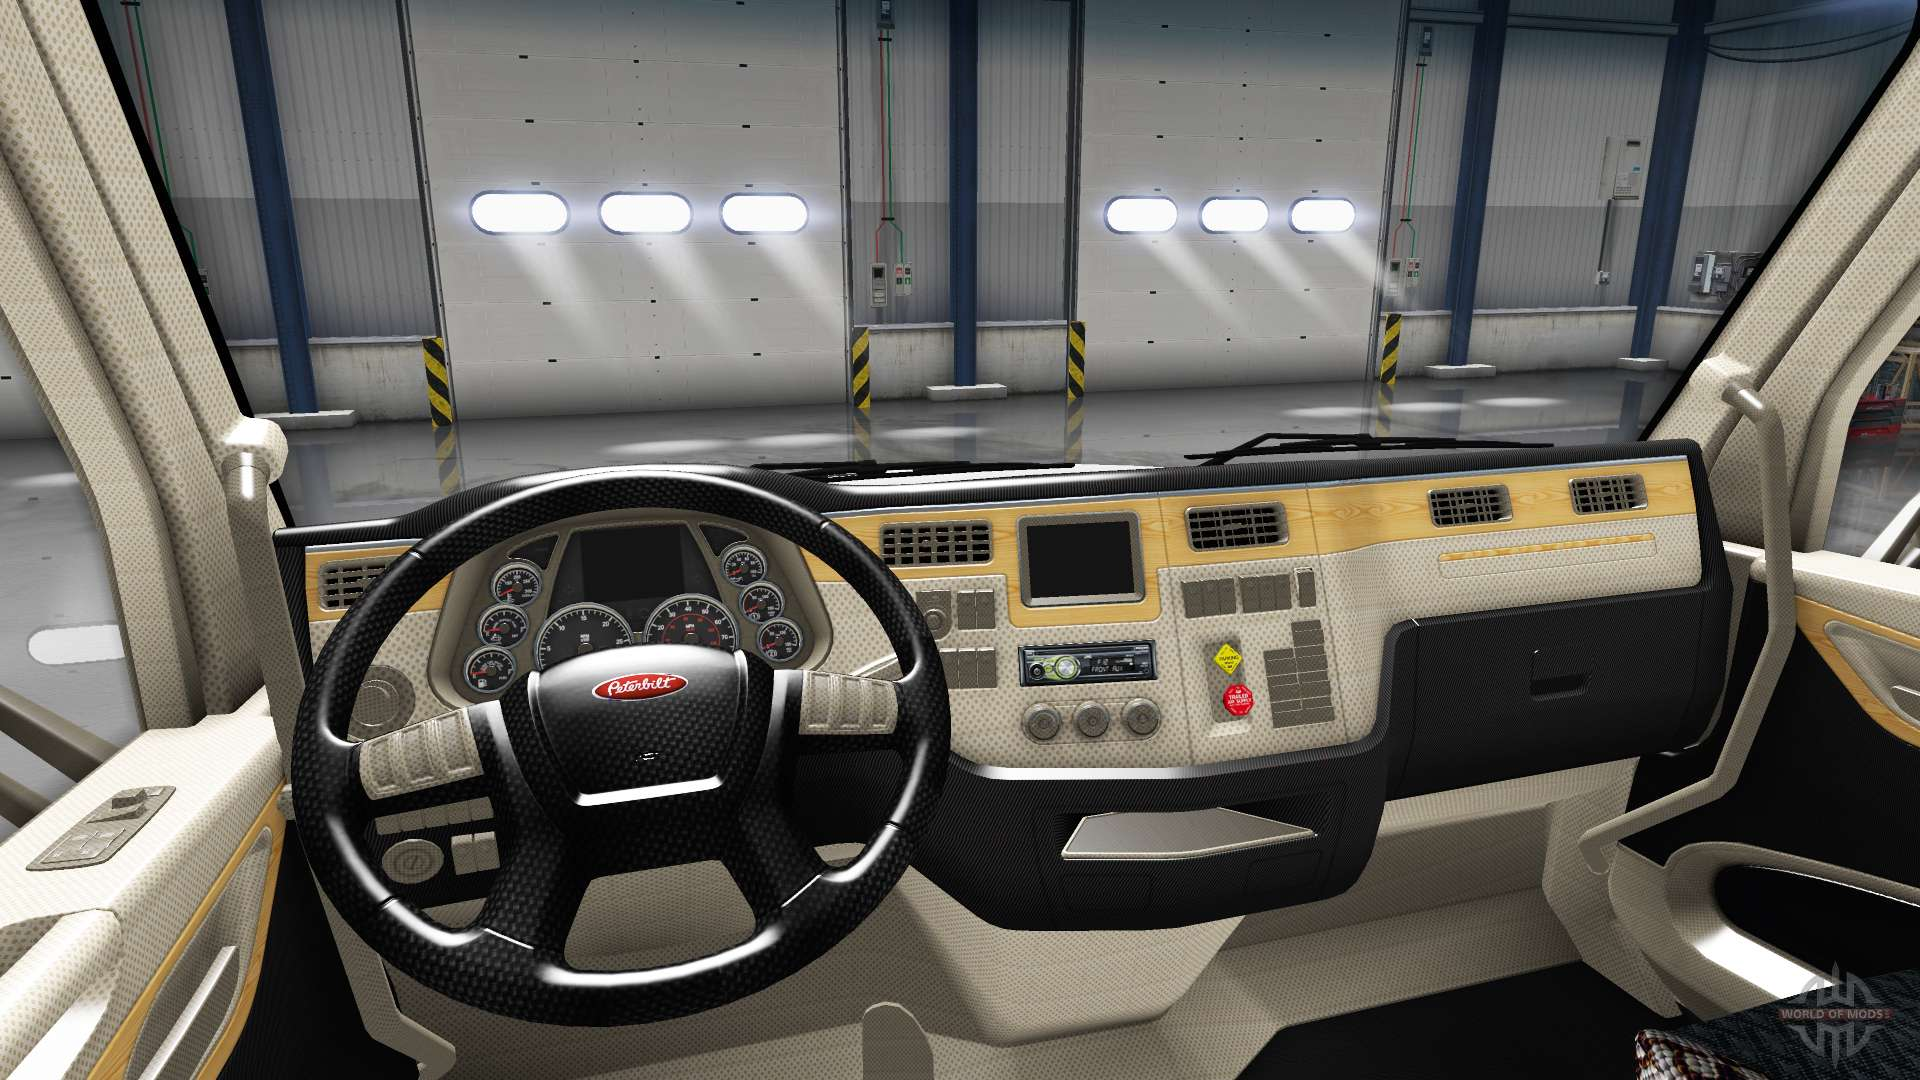 2017 Peterbilt 579 >> Redesigned the interior in a Peterbilt 579 for American Truck Simulator